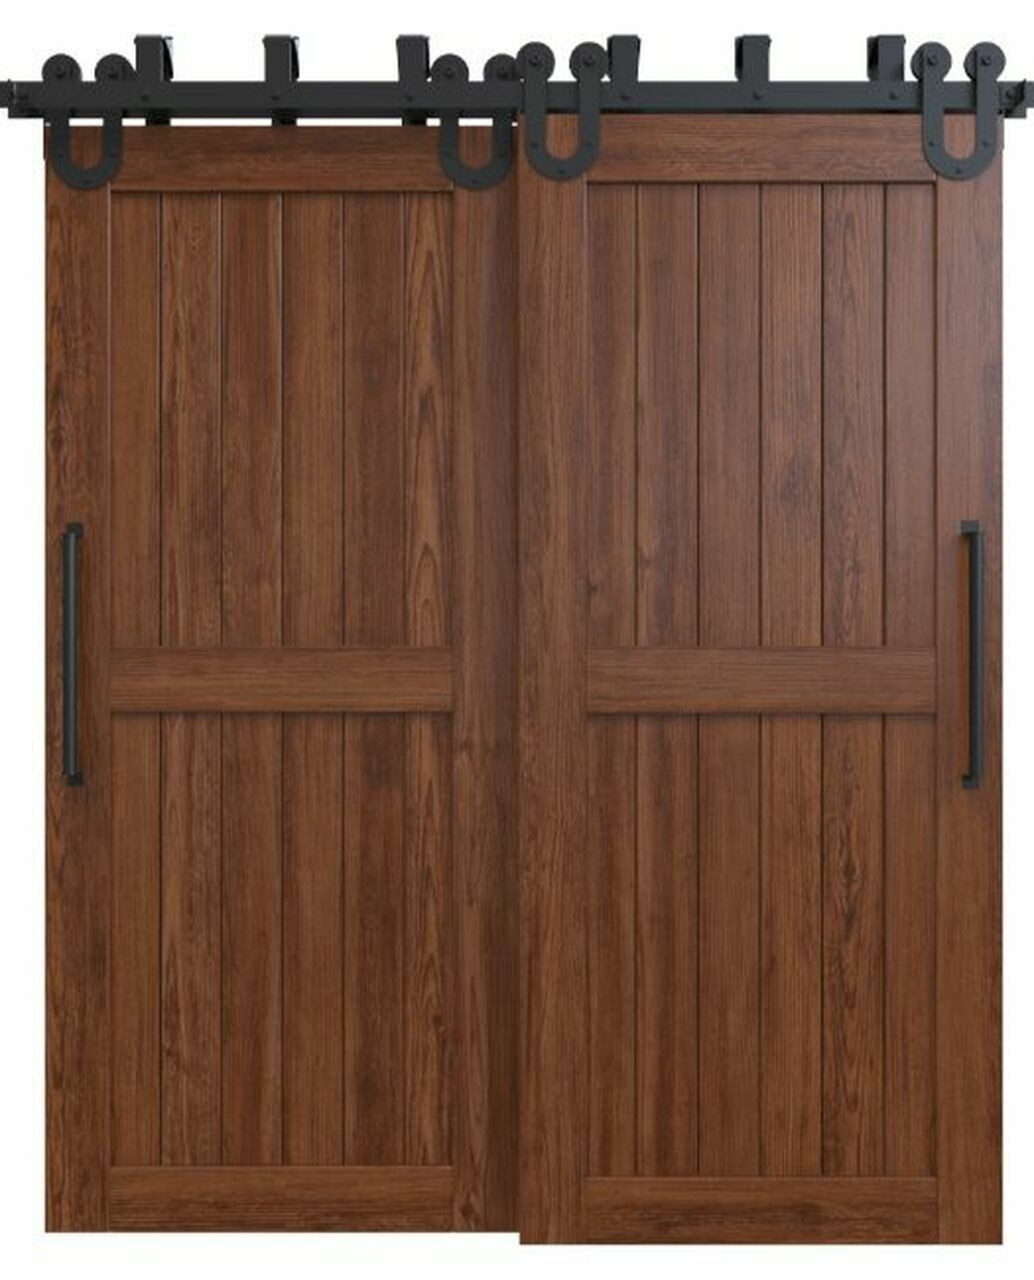 naples dark stained wood 2 panel bypass barn door